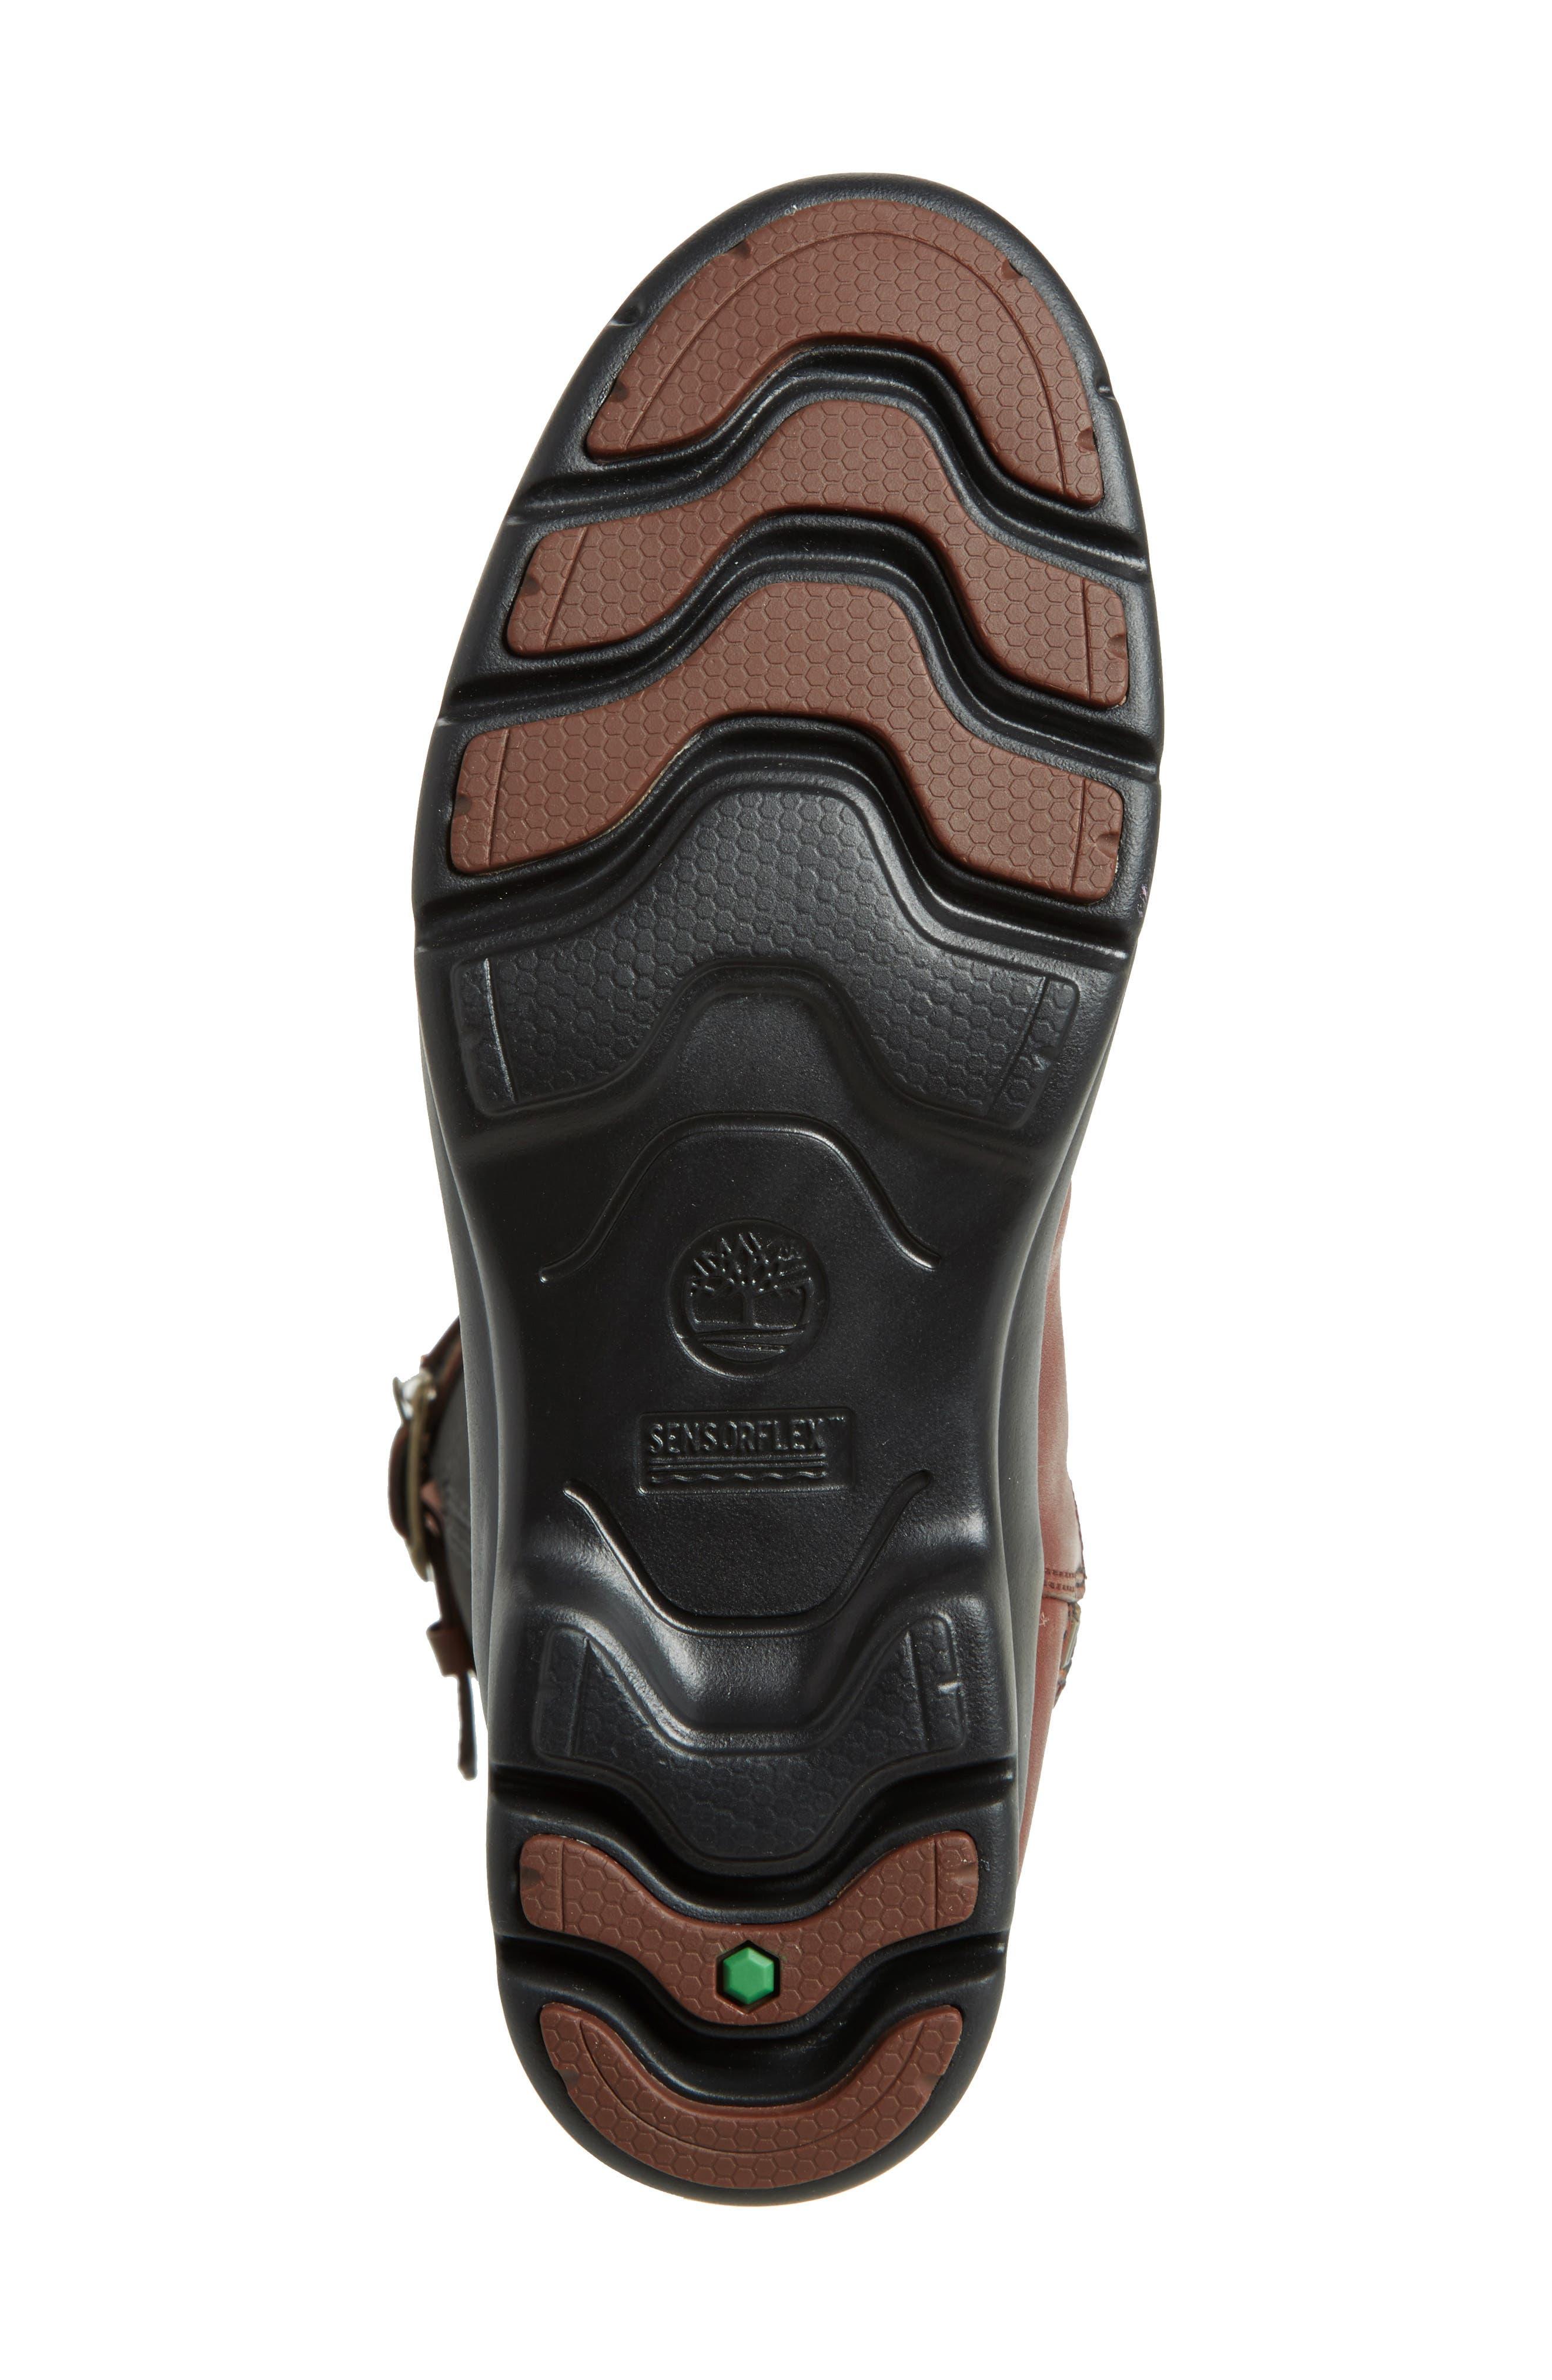 Turain Tall Waterproof Boot,                             Alternate thumbnail 6, color,                             Medium Brown Leather